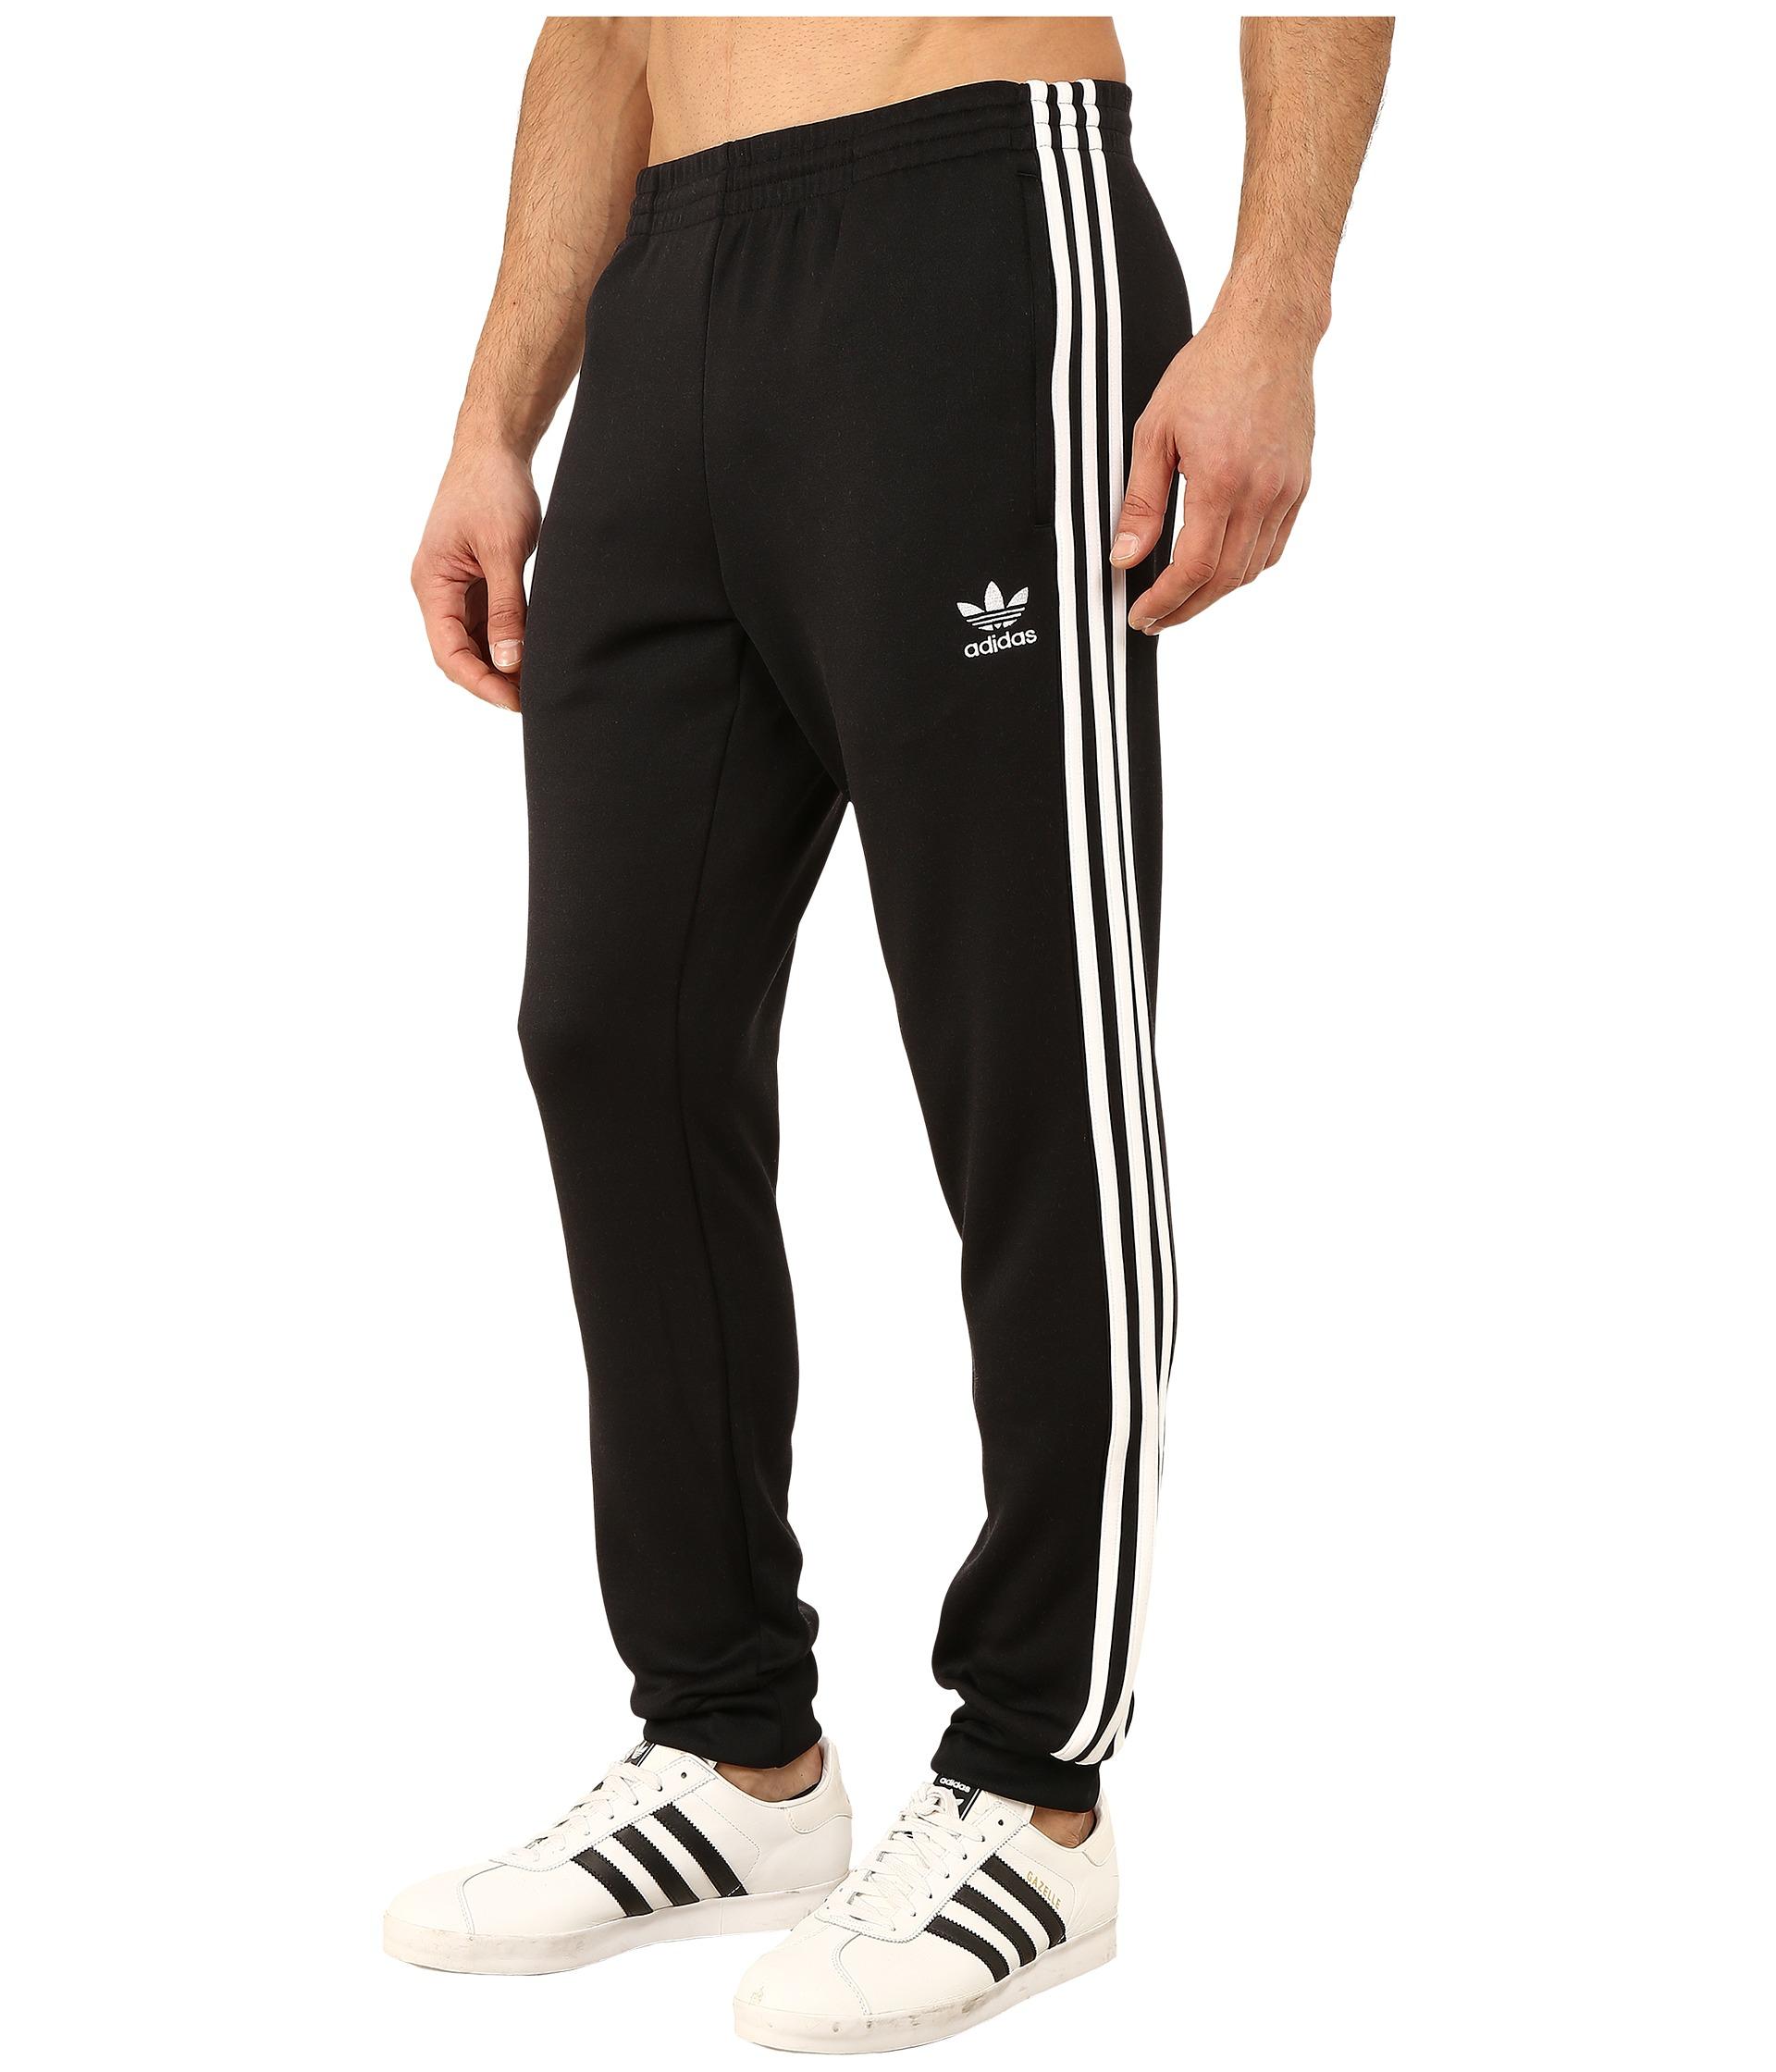 reputable site 4c3e7 8f08d Lyst - adidas Originals Superstar Cuffed Track Pants in Blac